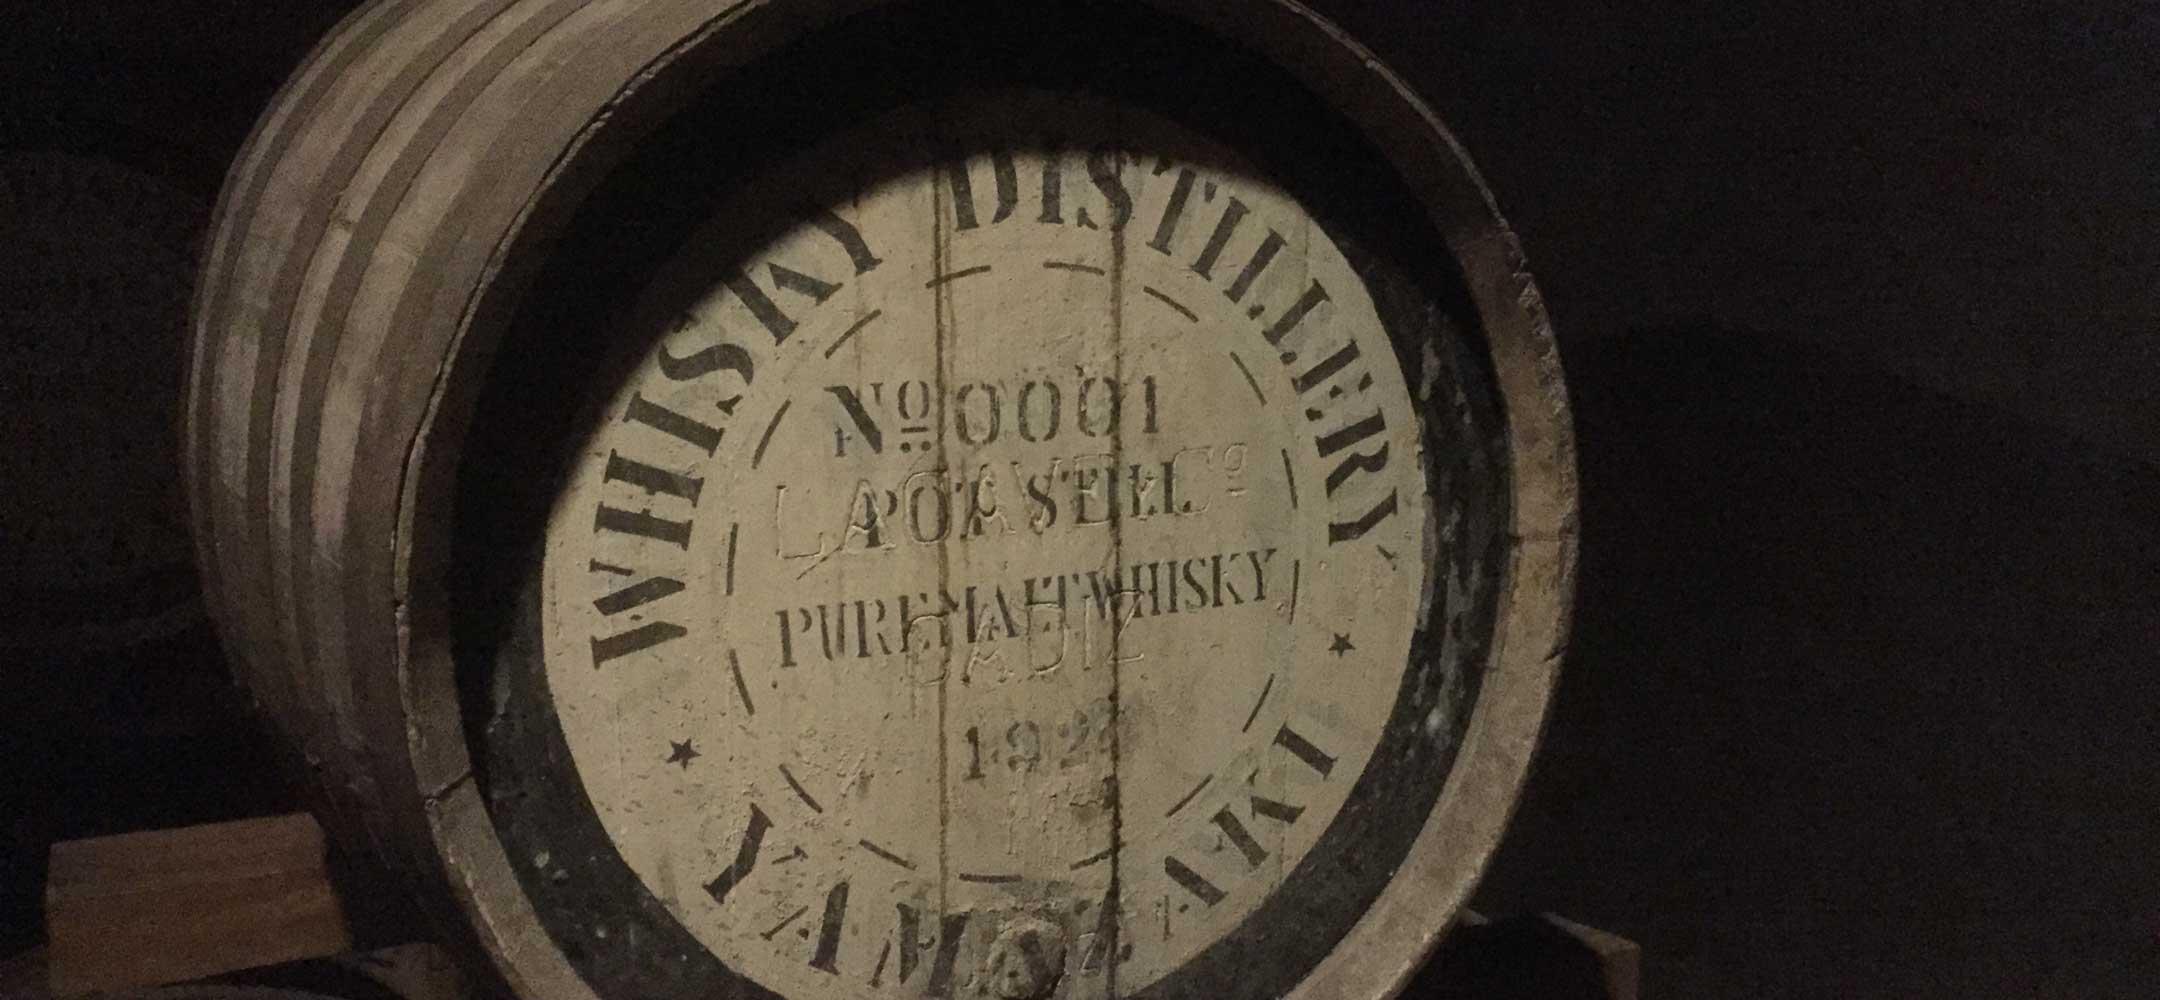 Japanese whisky barrel